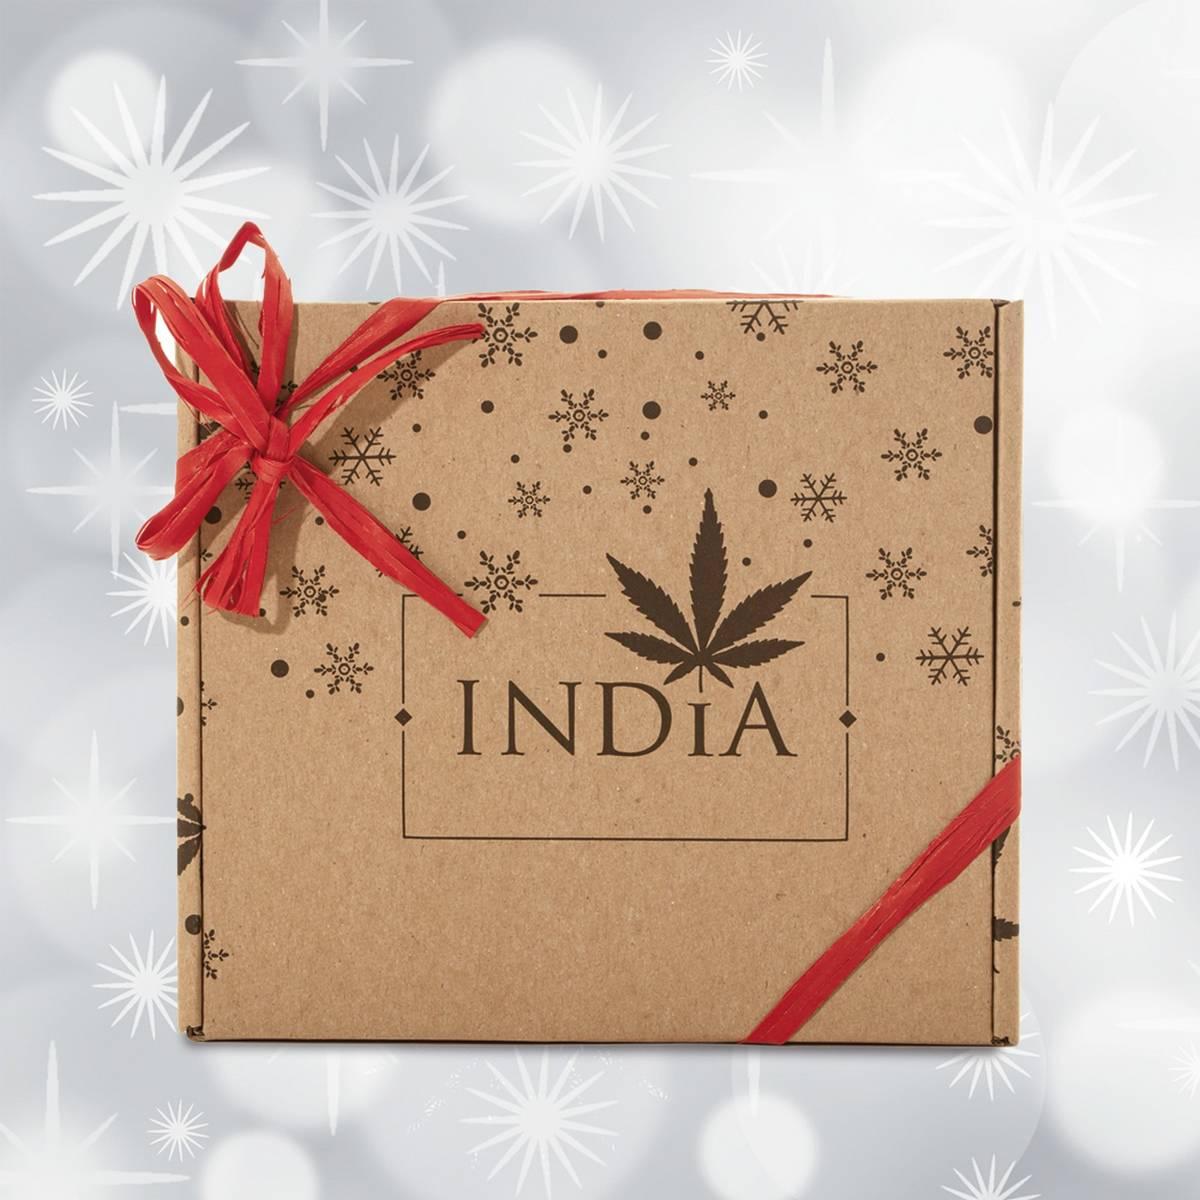 India Mini Zestaw (pomadka, krem do twarzy, serum)